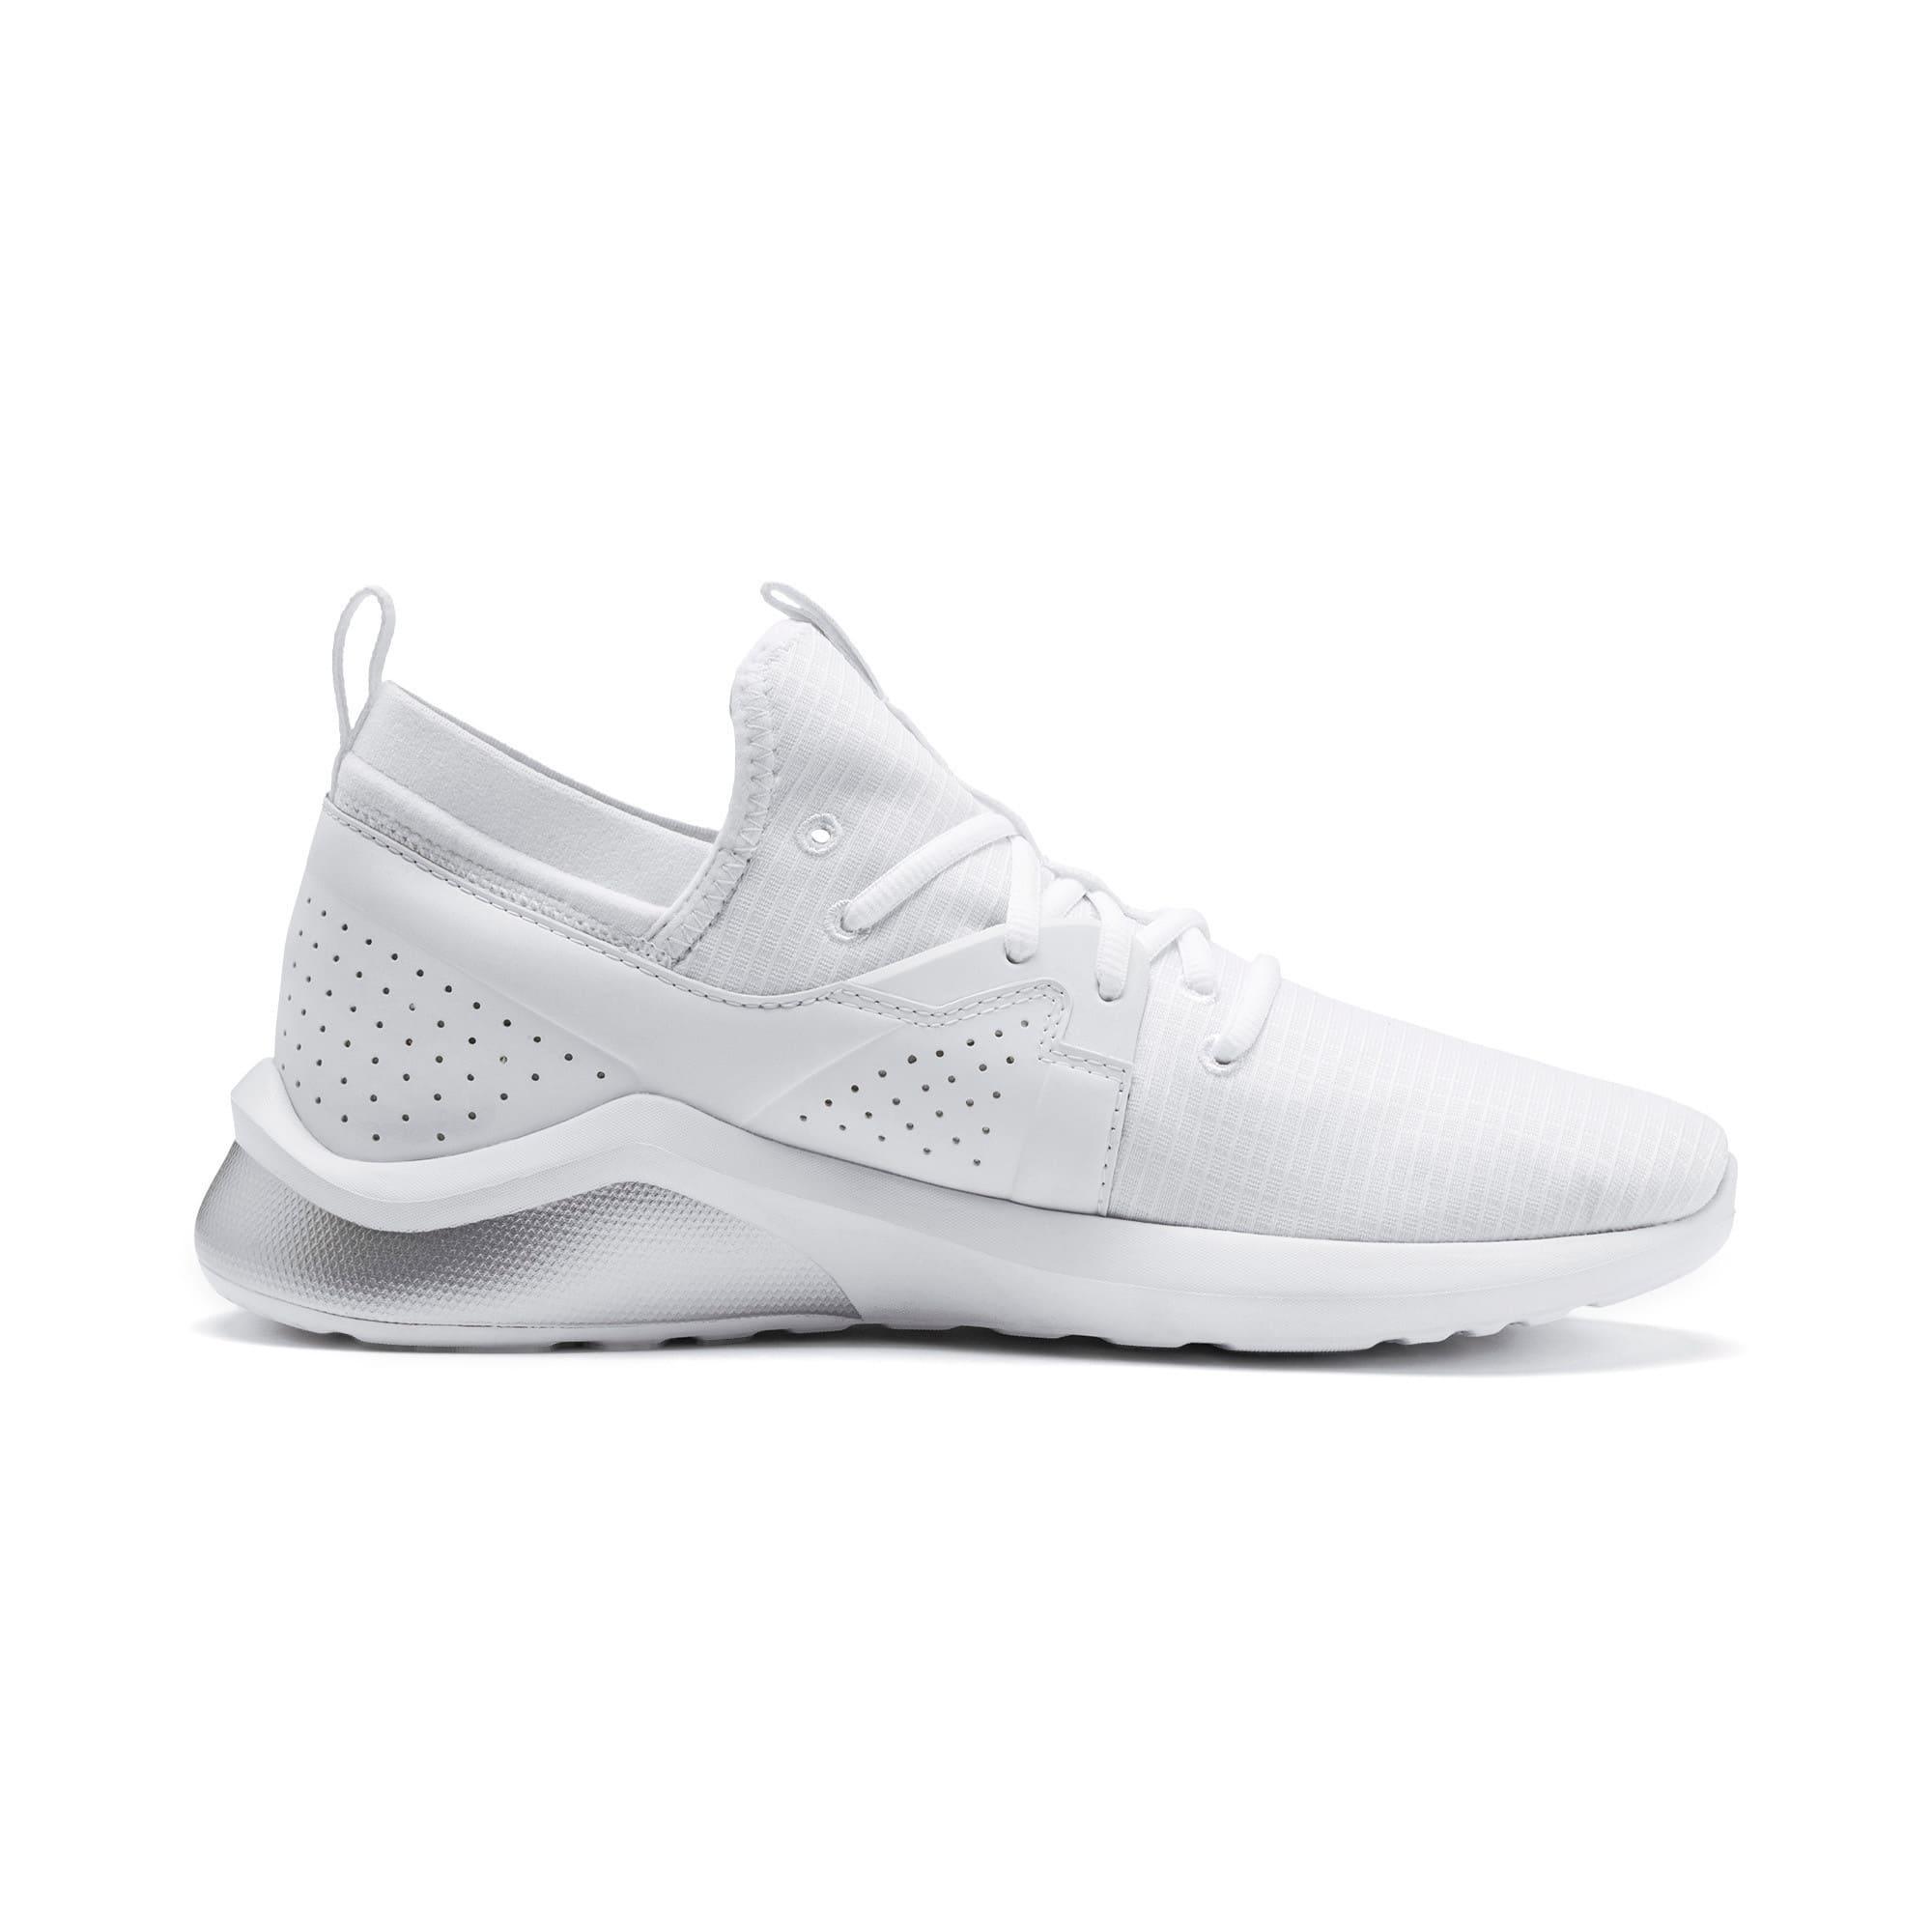 Thumbnail 5 of Emergence Lights Men's Running Shoes, Puma White-Puma Silver, medium-IND